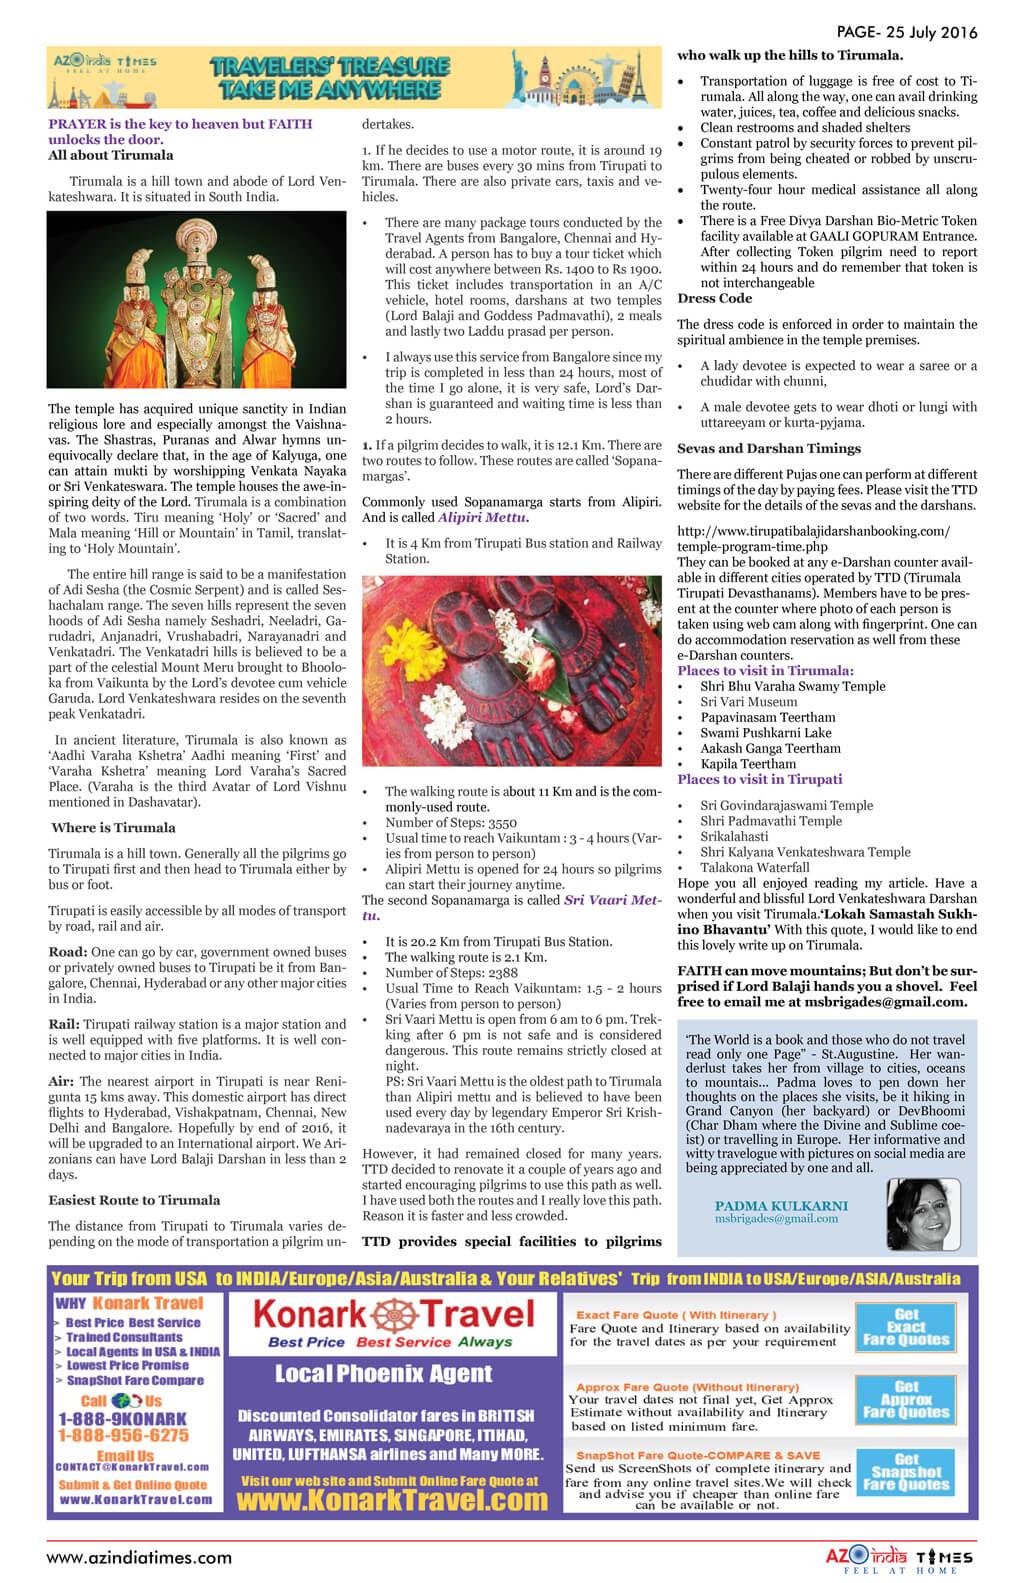 AZ INDIA NEWS PAGE-25